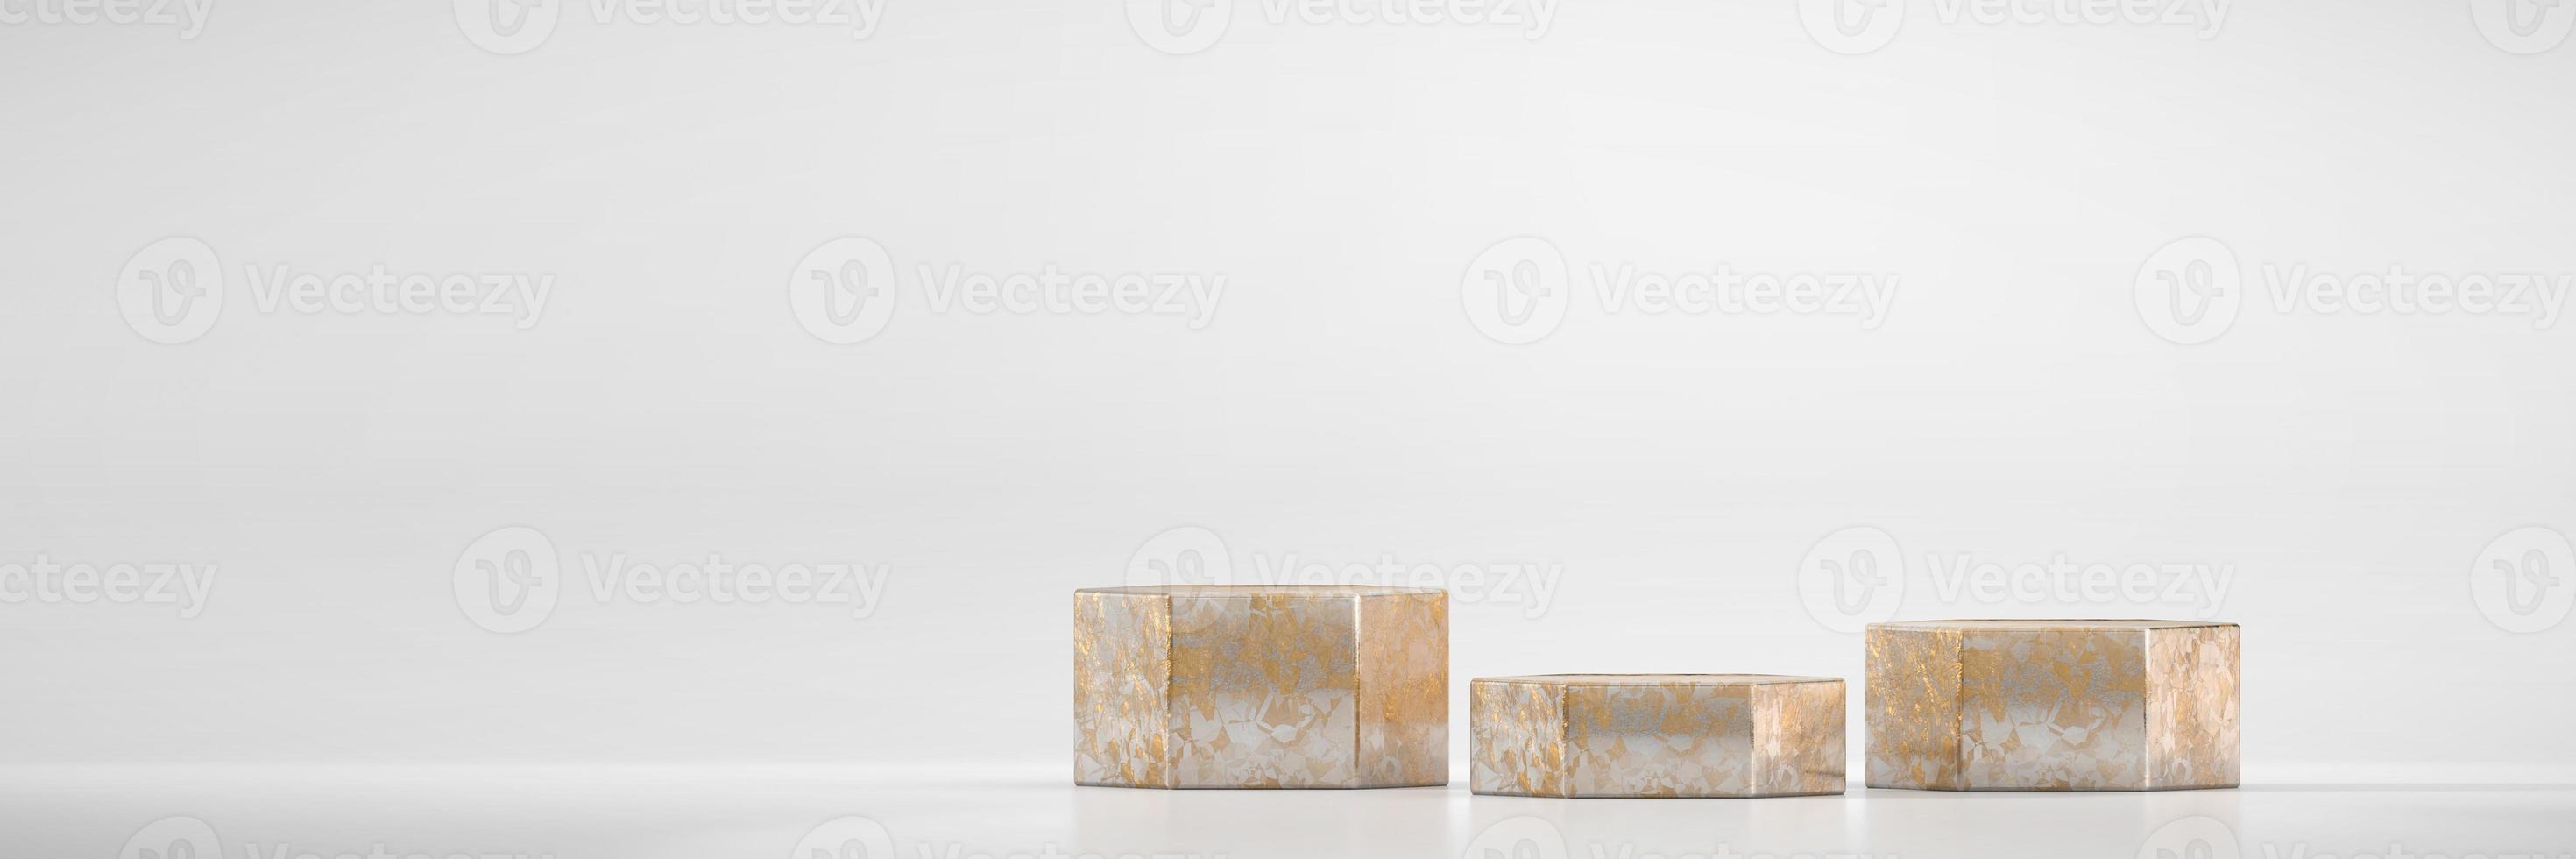 podium podium platform mockup voor productvertoning foto